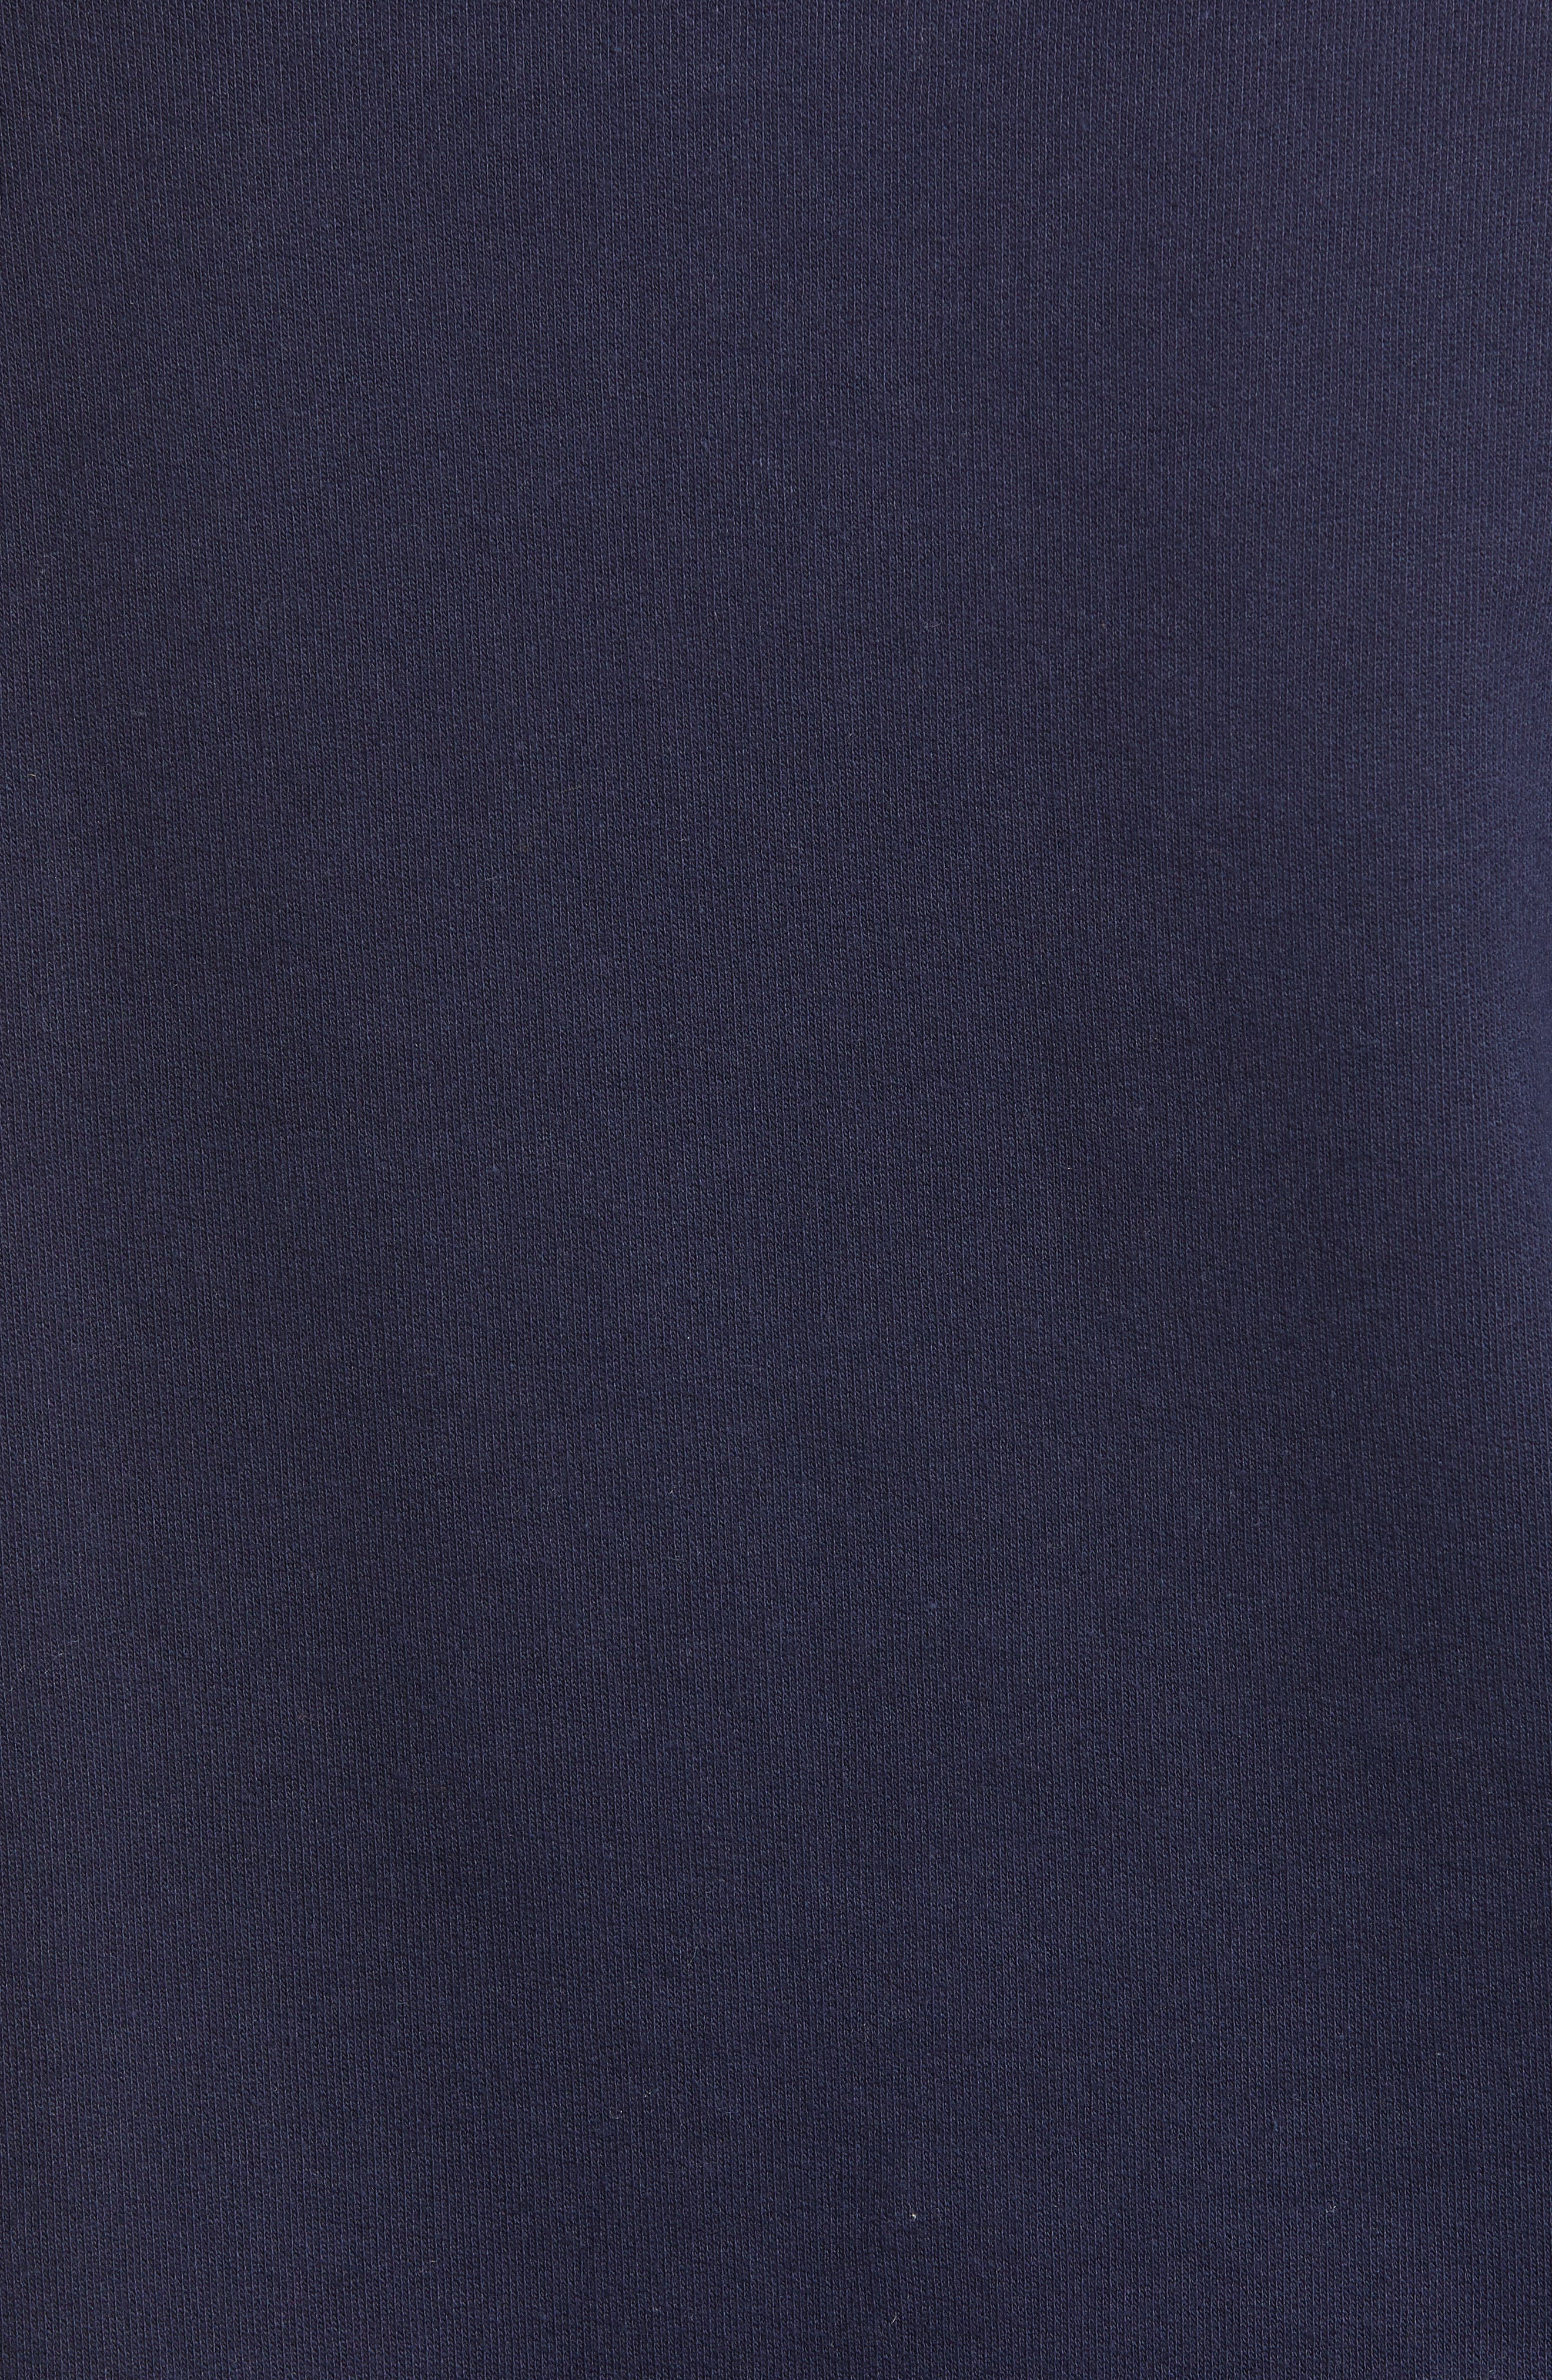 J.CREW, Champagne Sweatshirt, Alternate thumbnail 5, color, 400